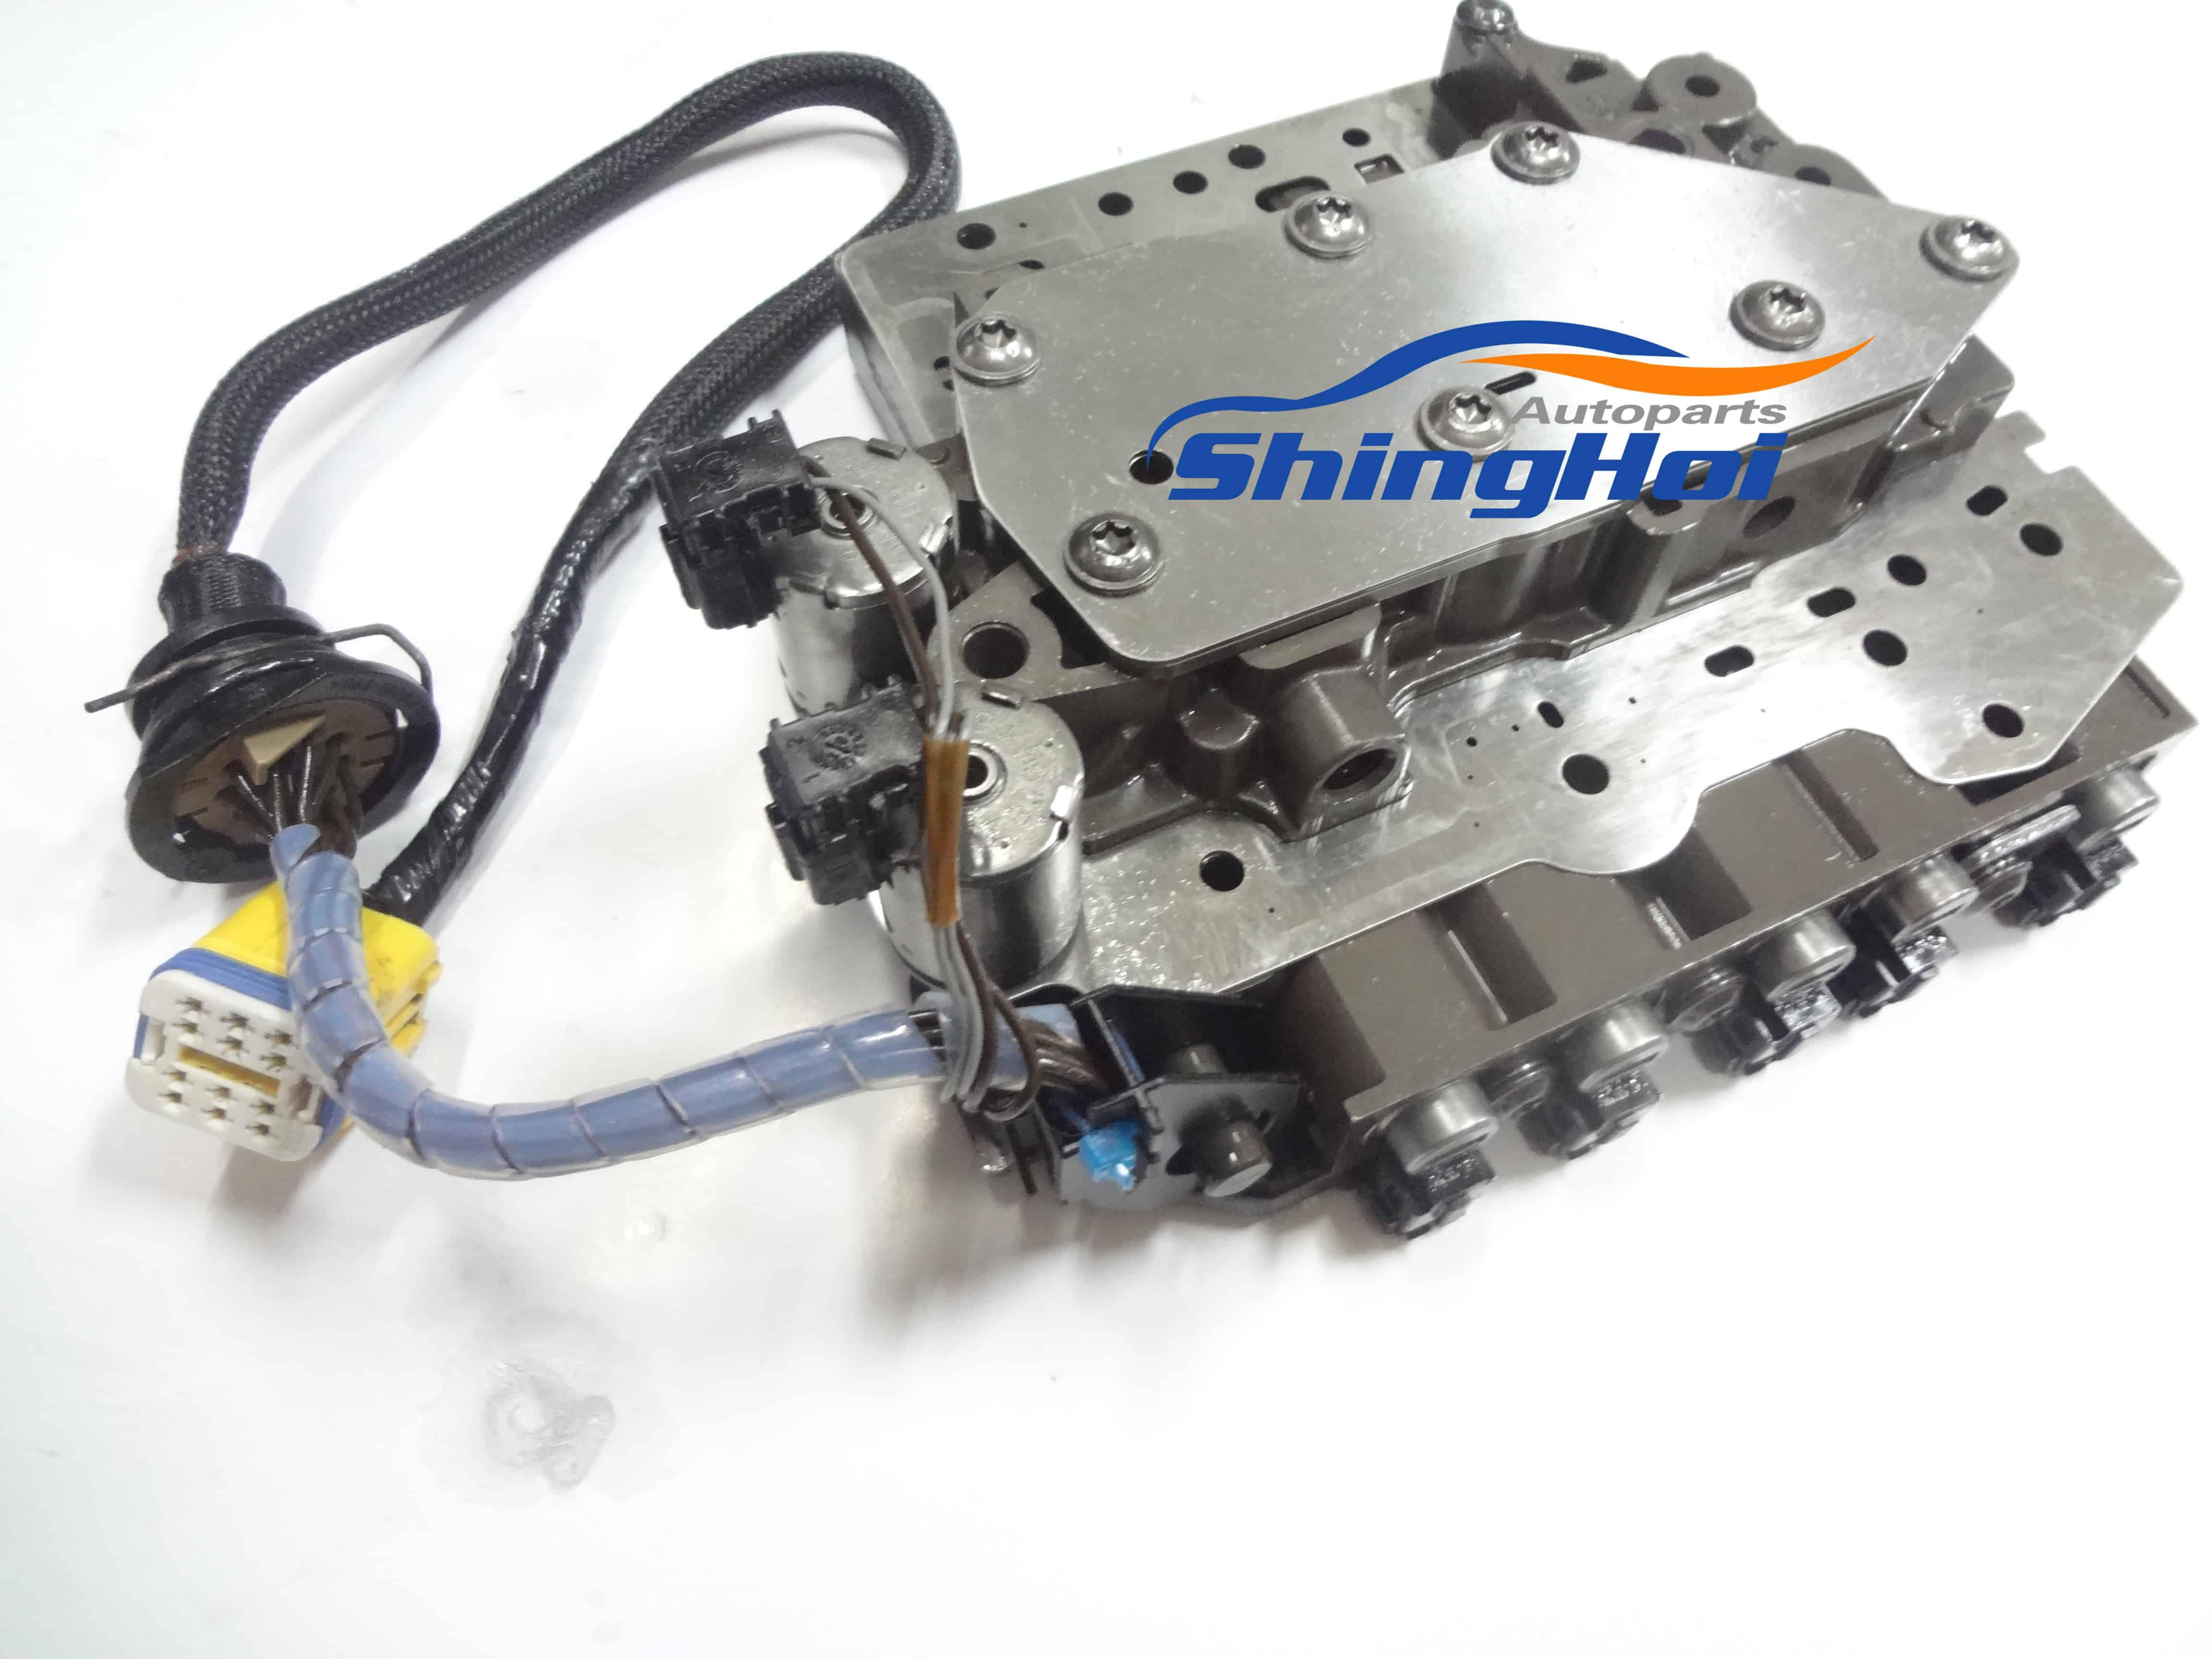 AL4 DPO 2570E2 2570E3 Transmission Gearbox Valve Body for Peugeot